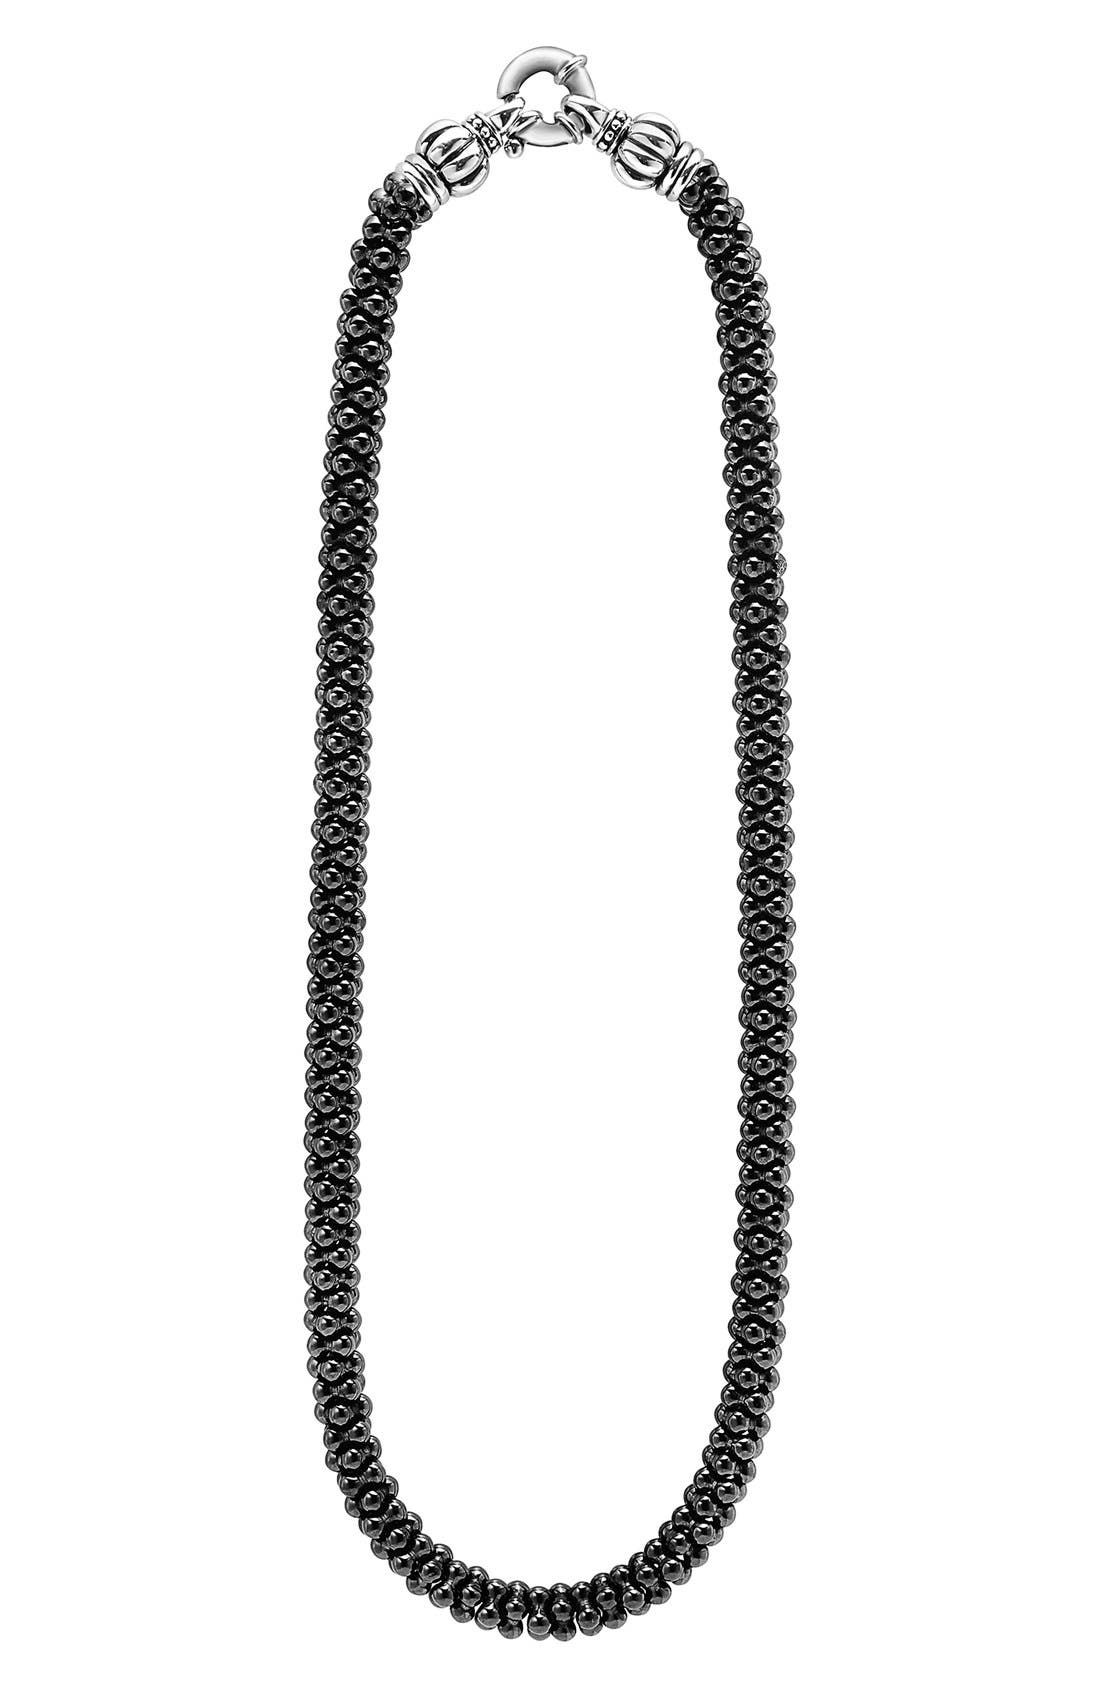 'Black Caviar' 7mm Beaded Necklace,                             Main thumbnail 1, color,                             BLACK CAVIAR